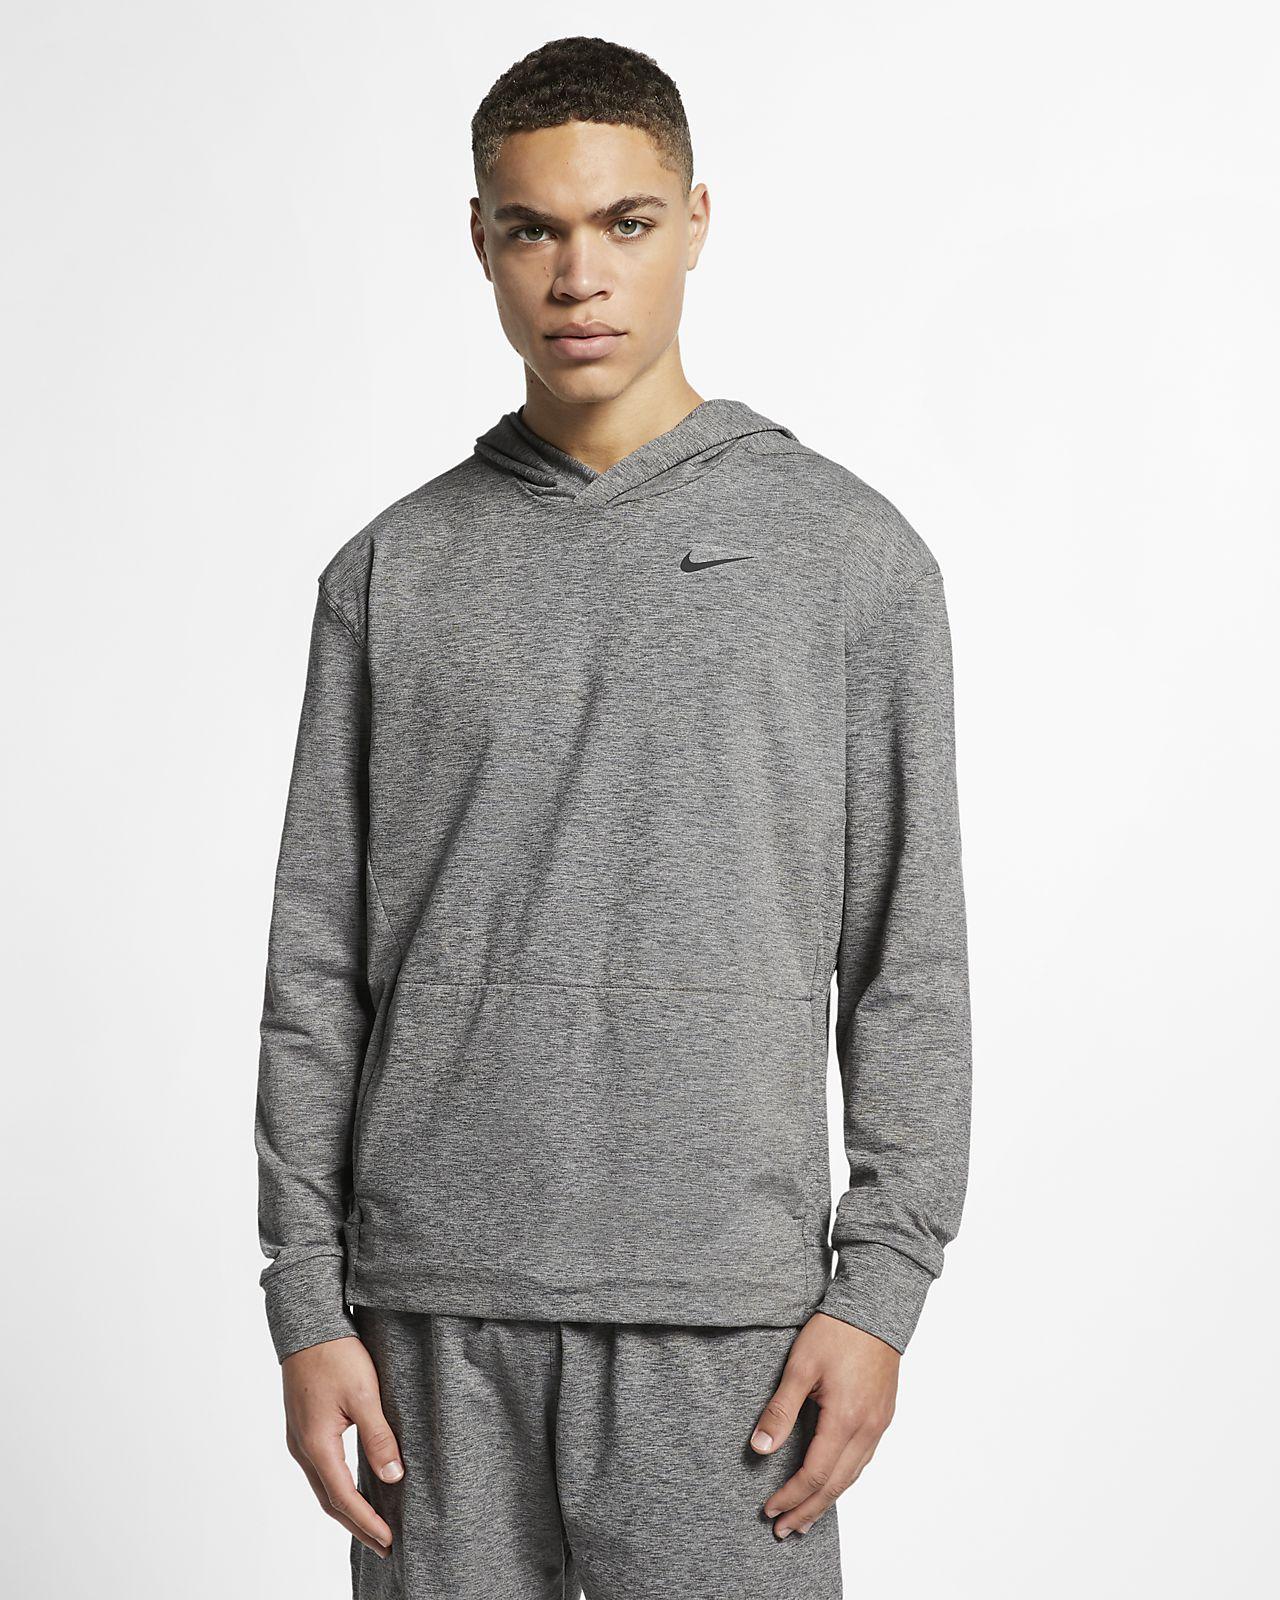 Nike Dri-FIT Yogatrainingshoodie met lange mouwen voor heren